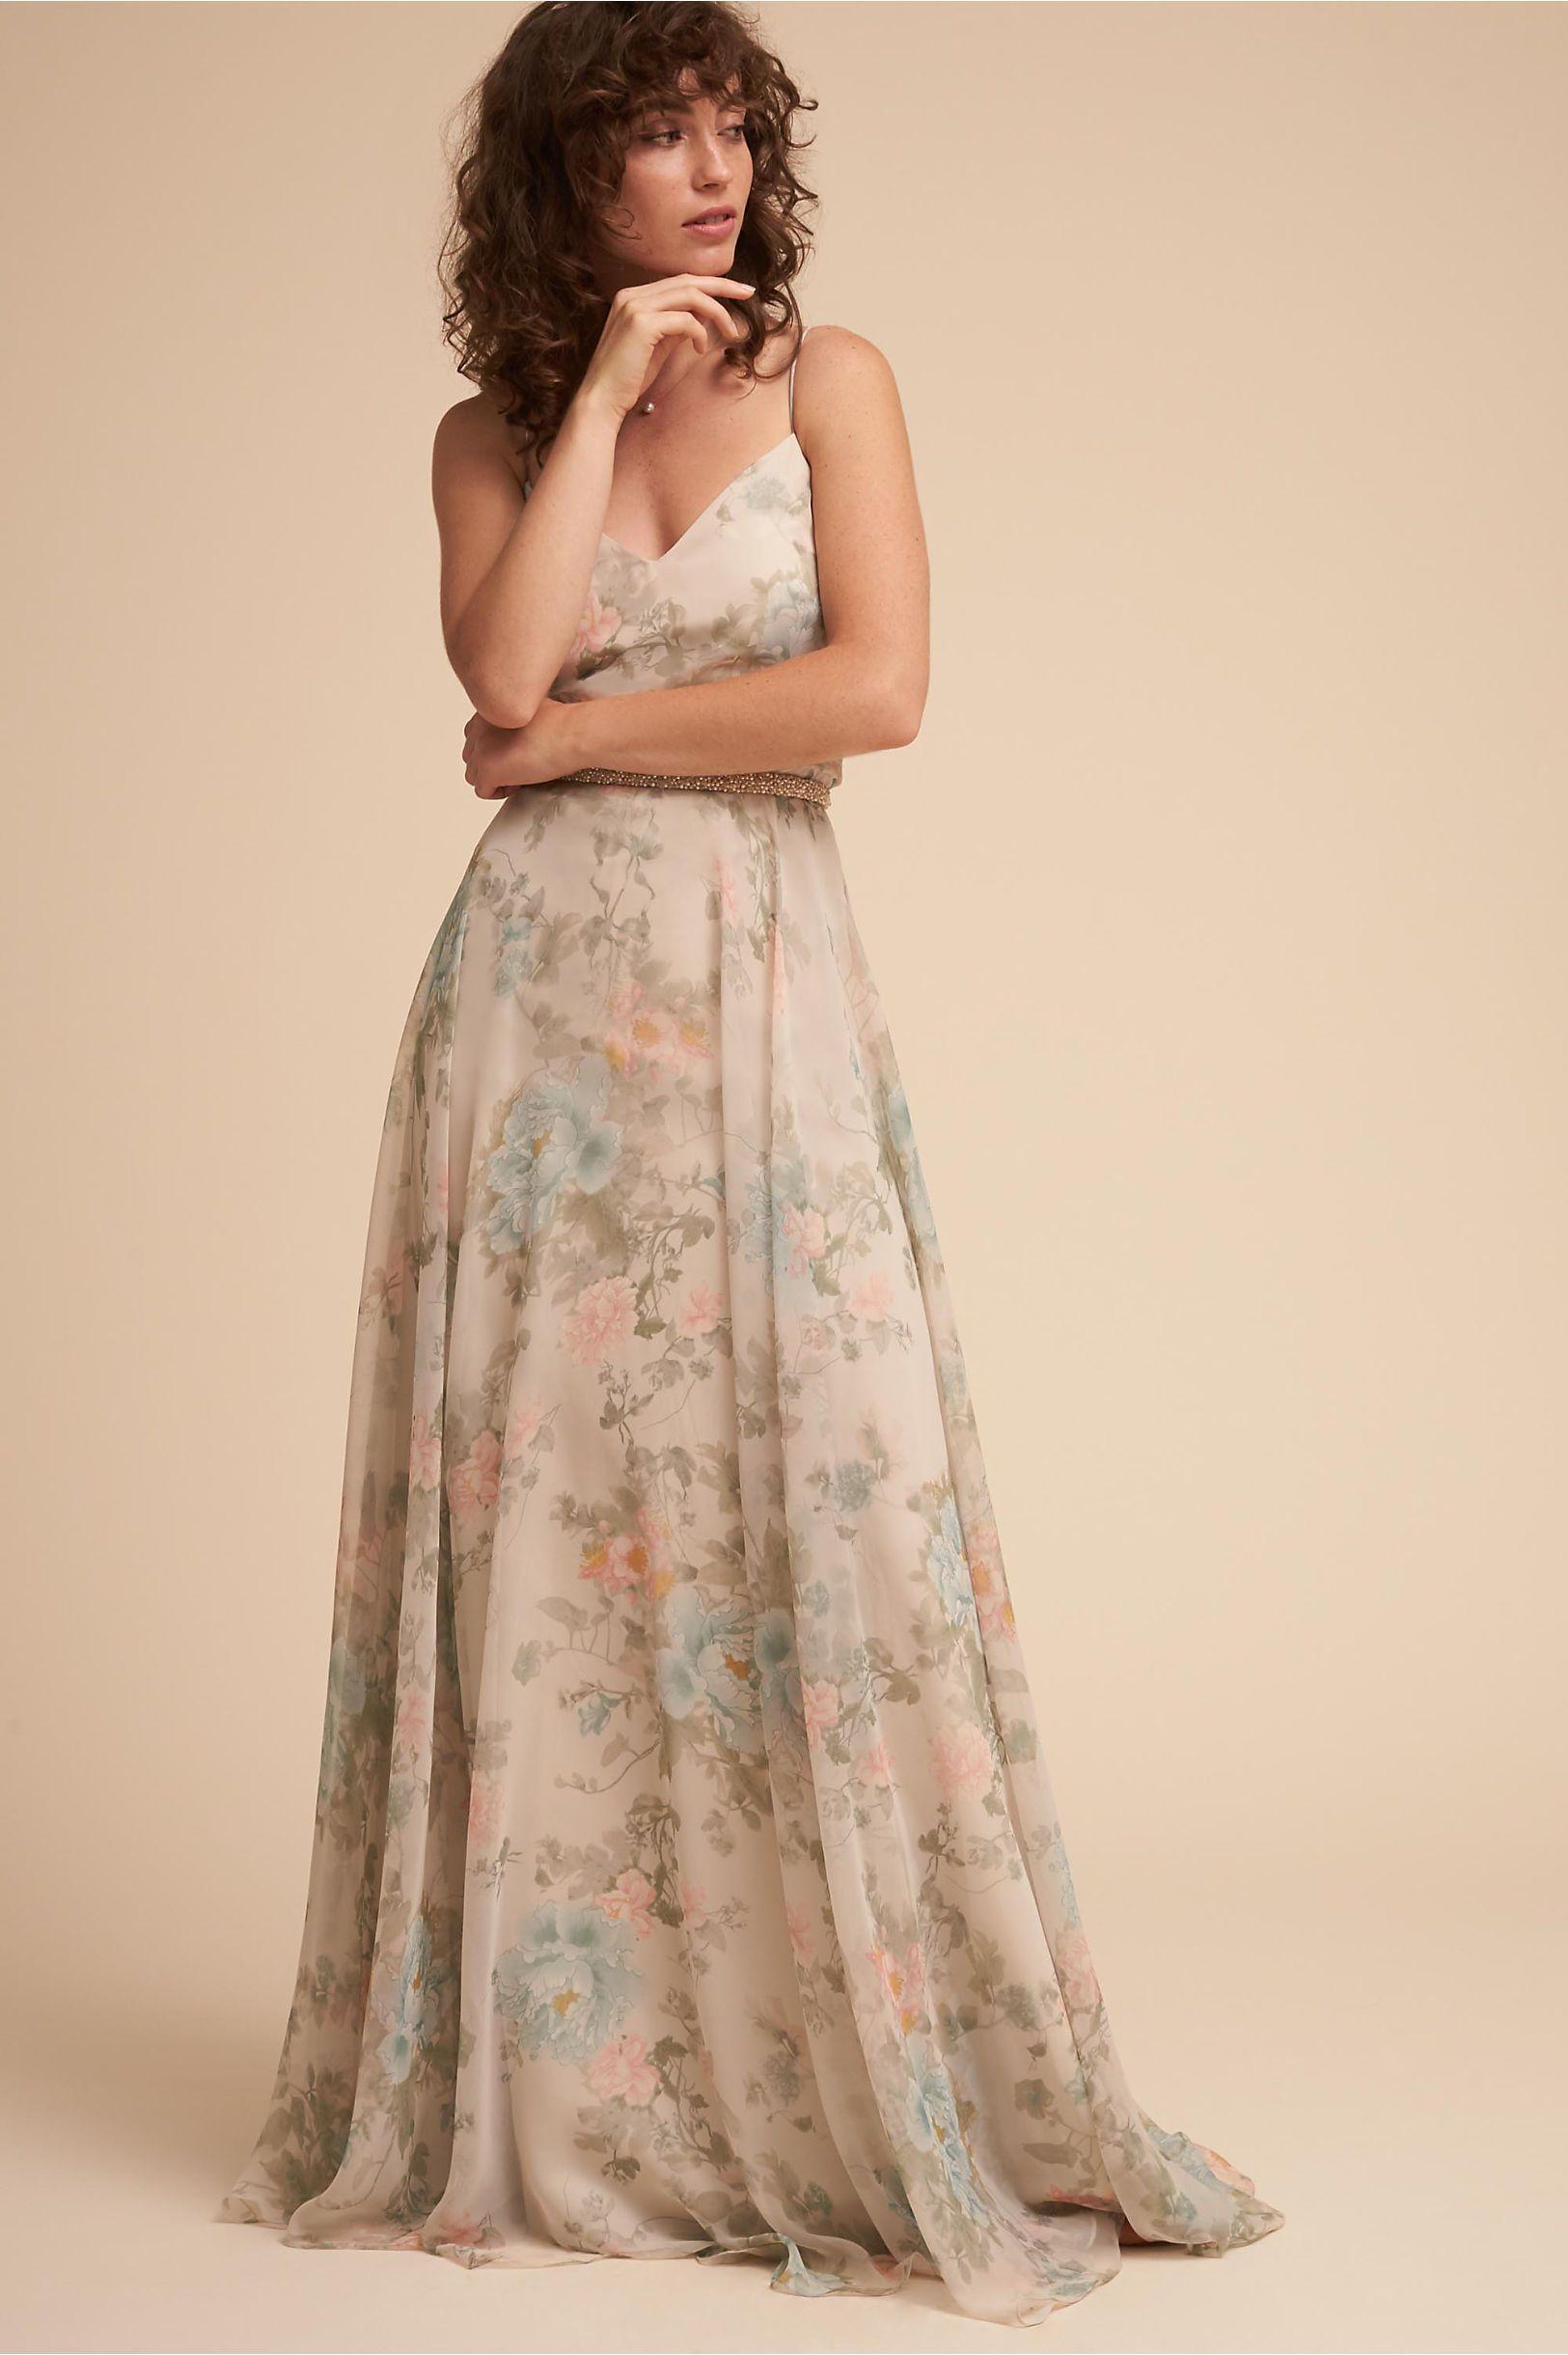 4a4daae51ee BHLDN s Jenny Yoo Inesse Dress in Peony Promenade